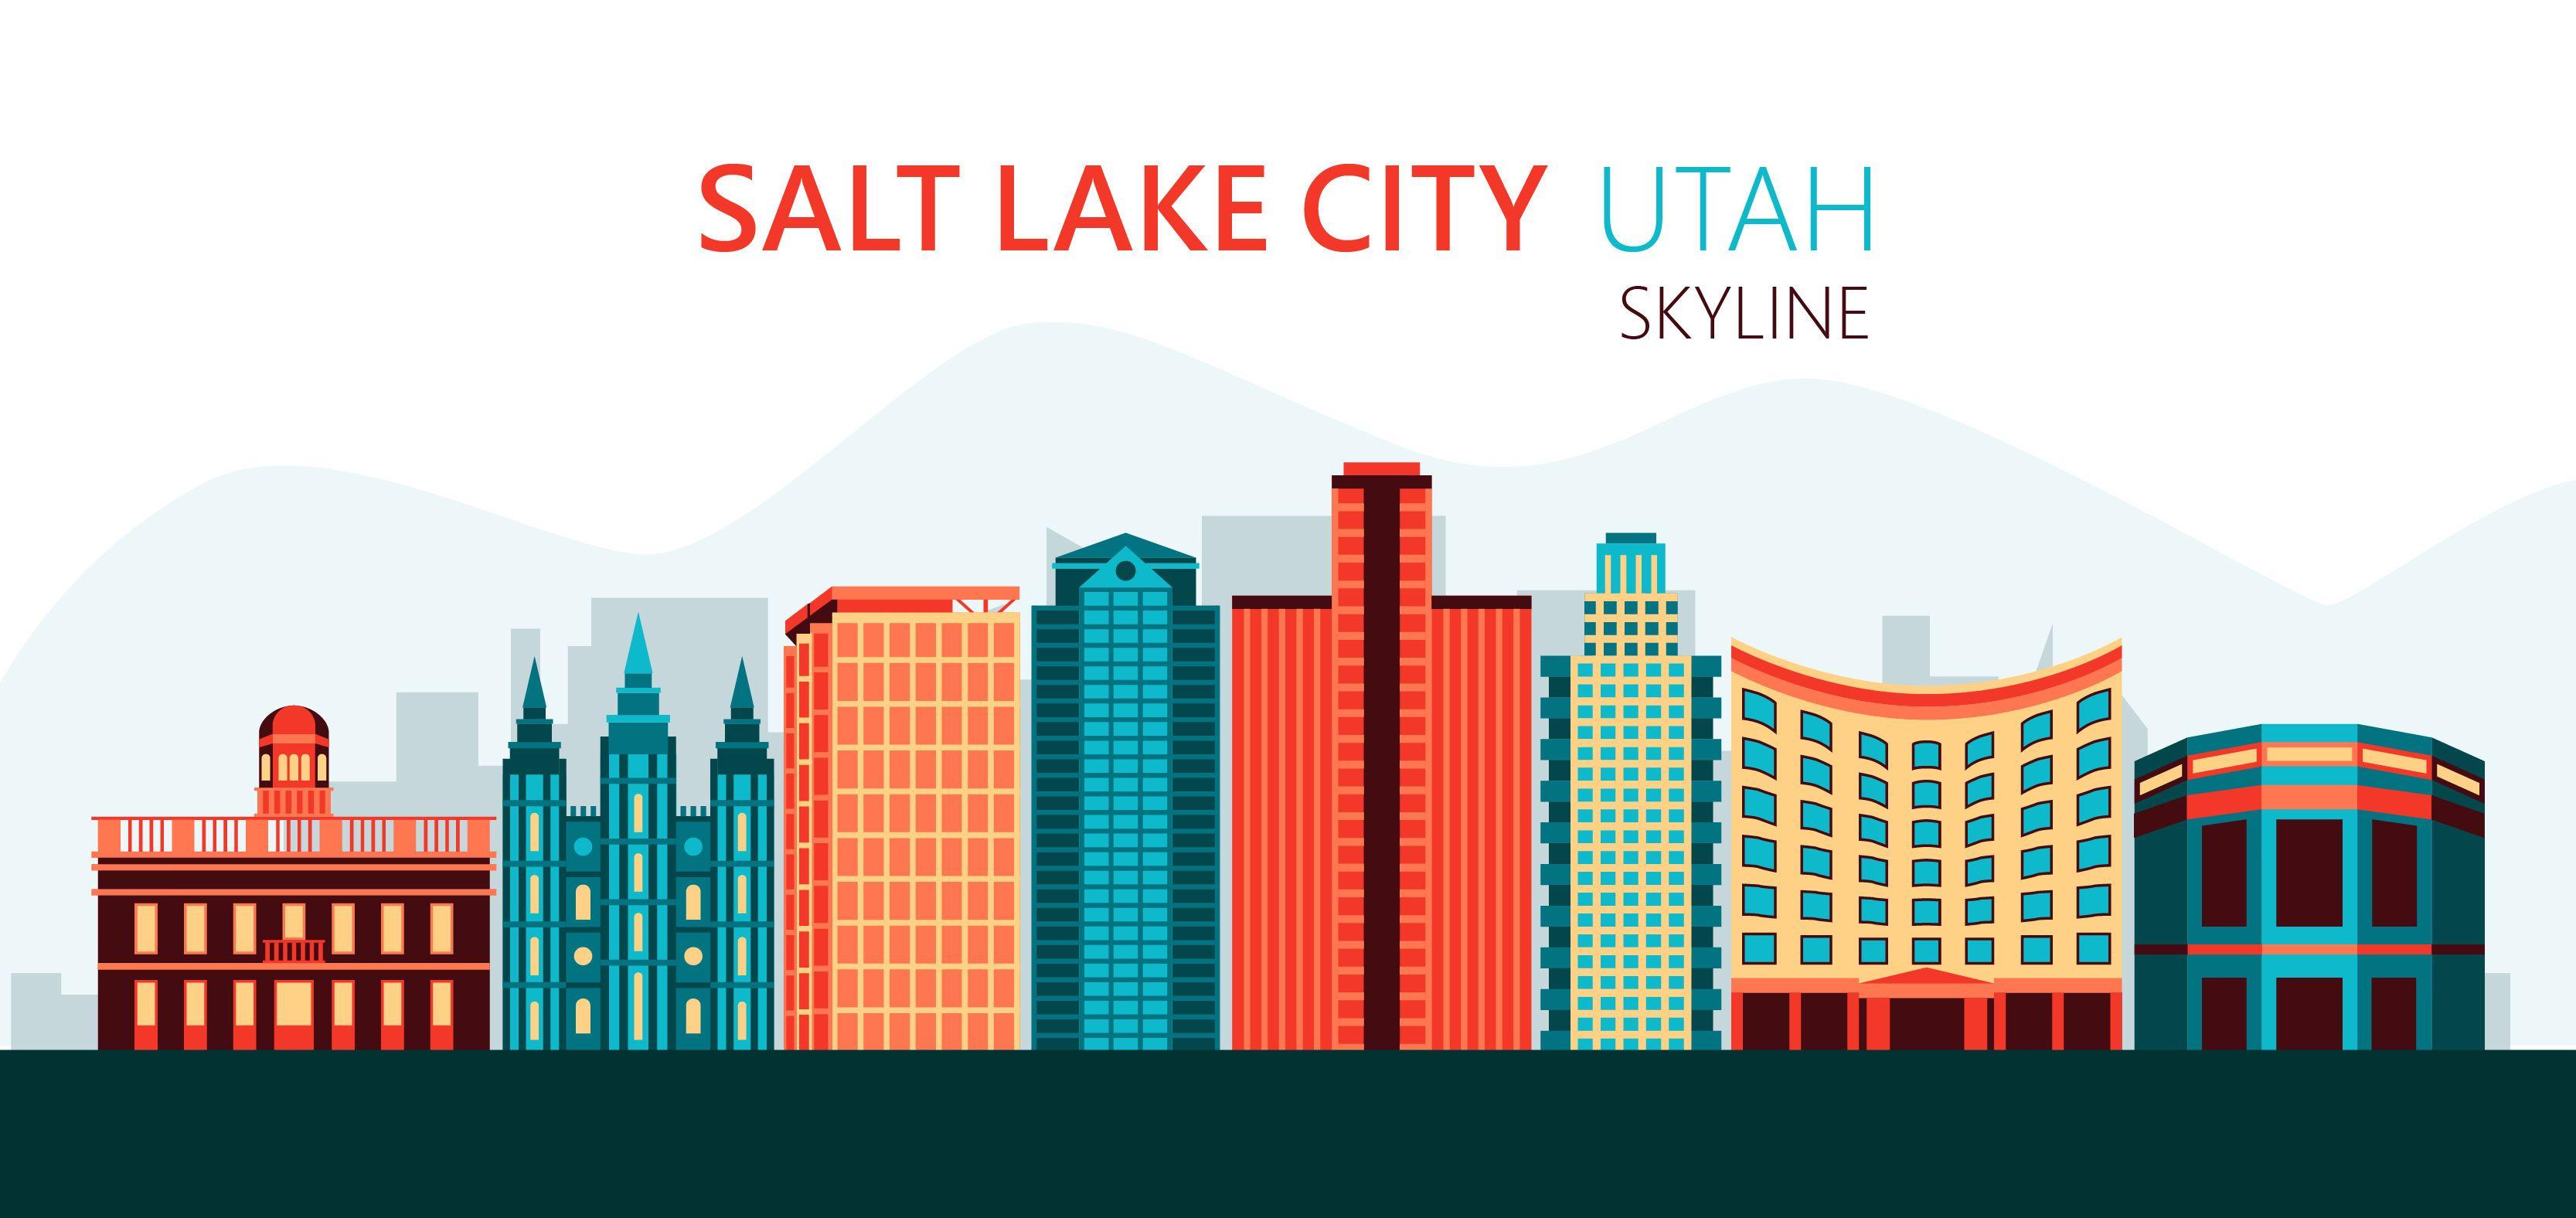 Salt Lake City skyline illustration